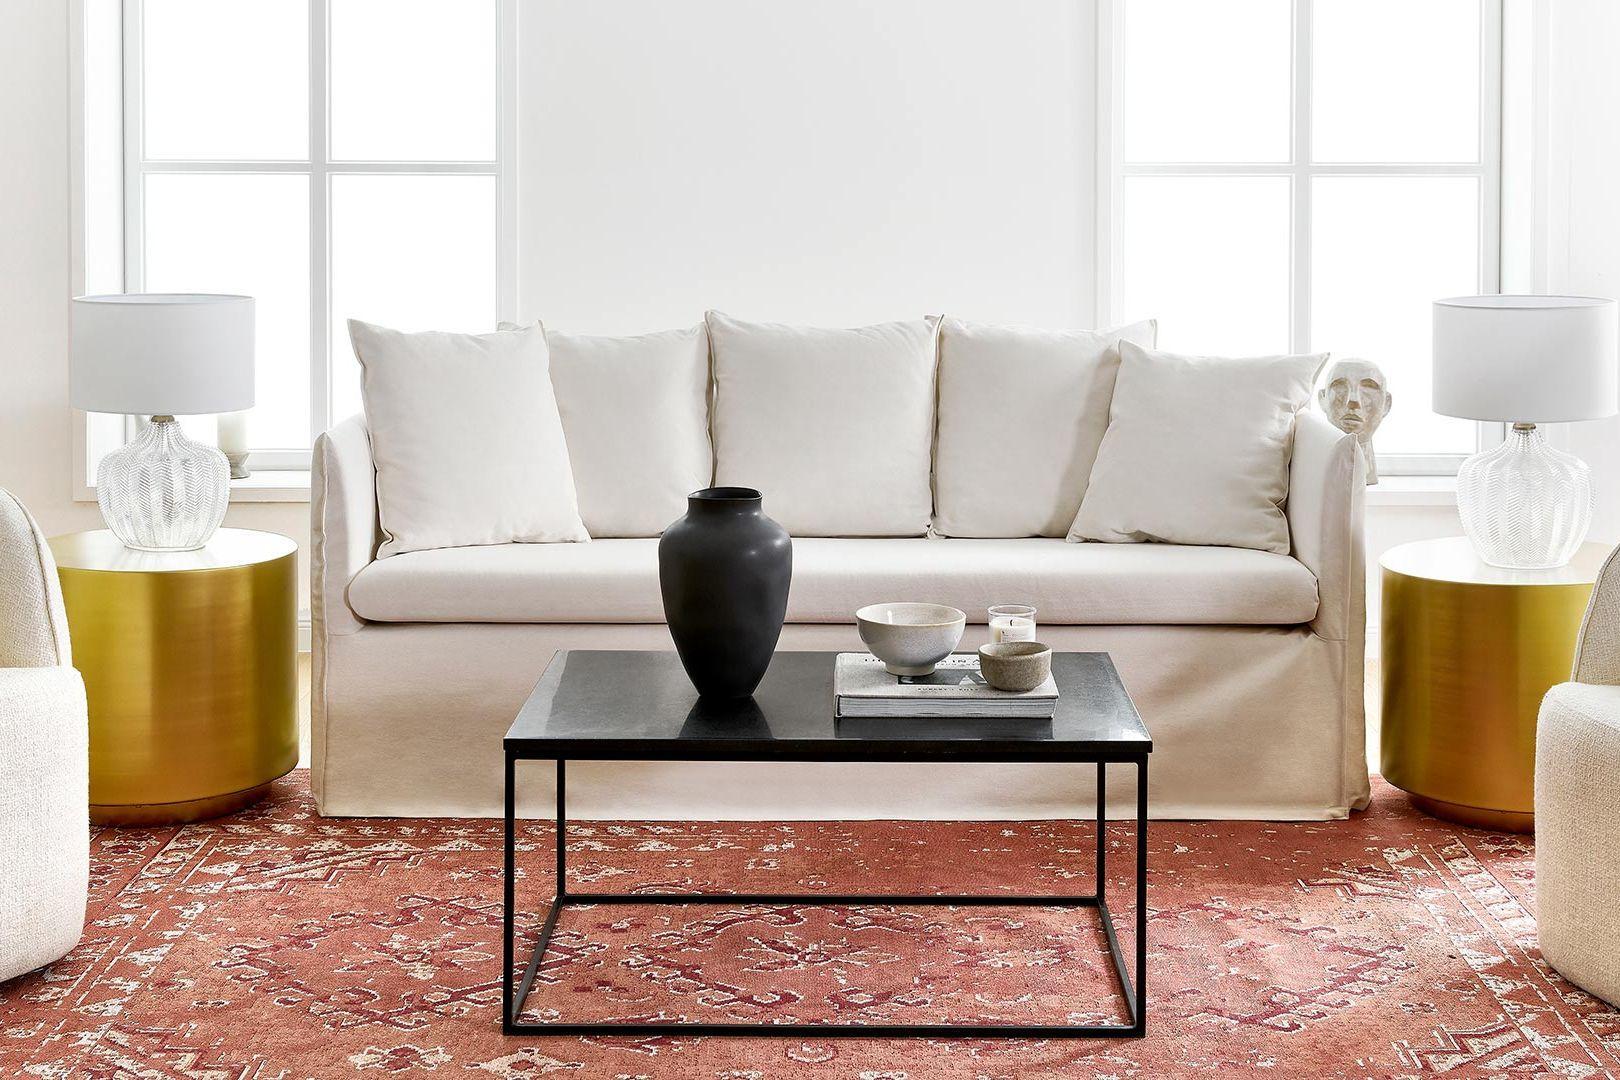 Sofa Mila: Elegant